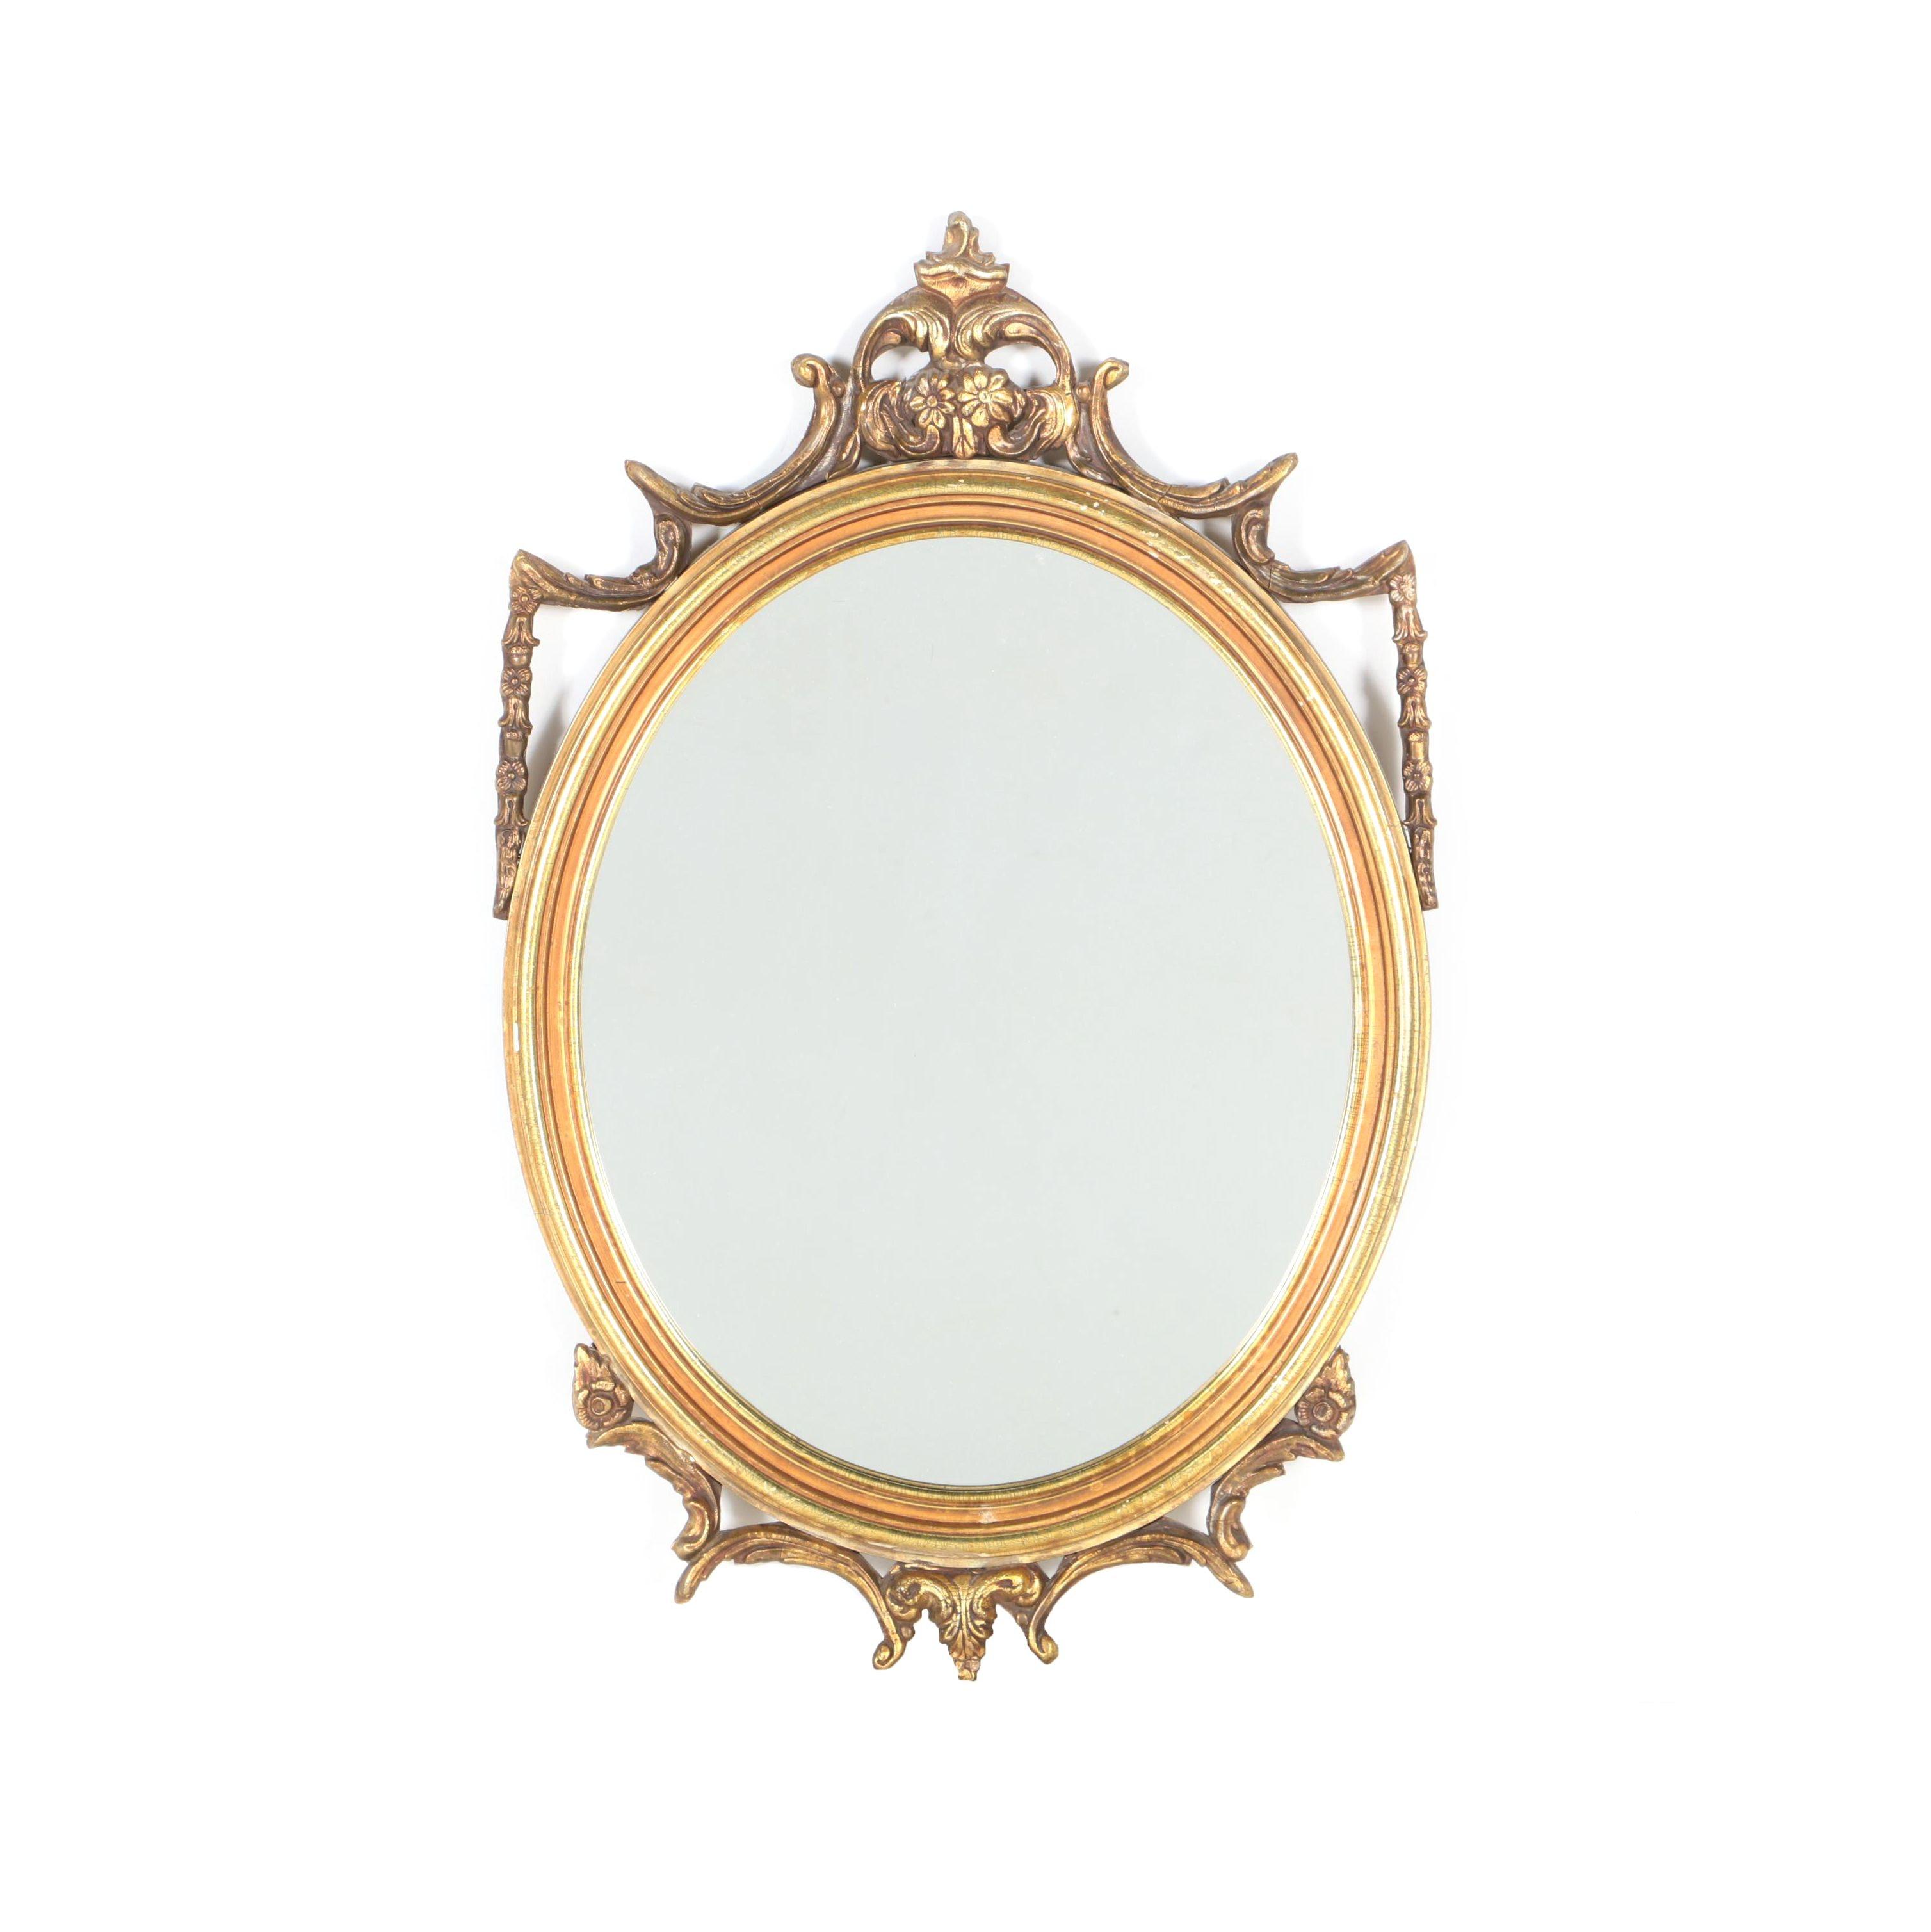 Ornate Wood Framed Wall Mirror